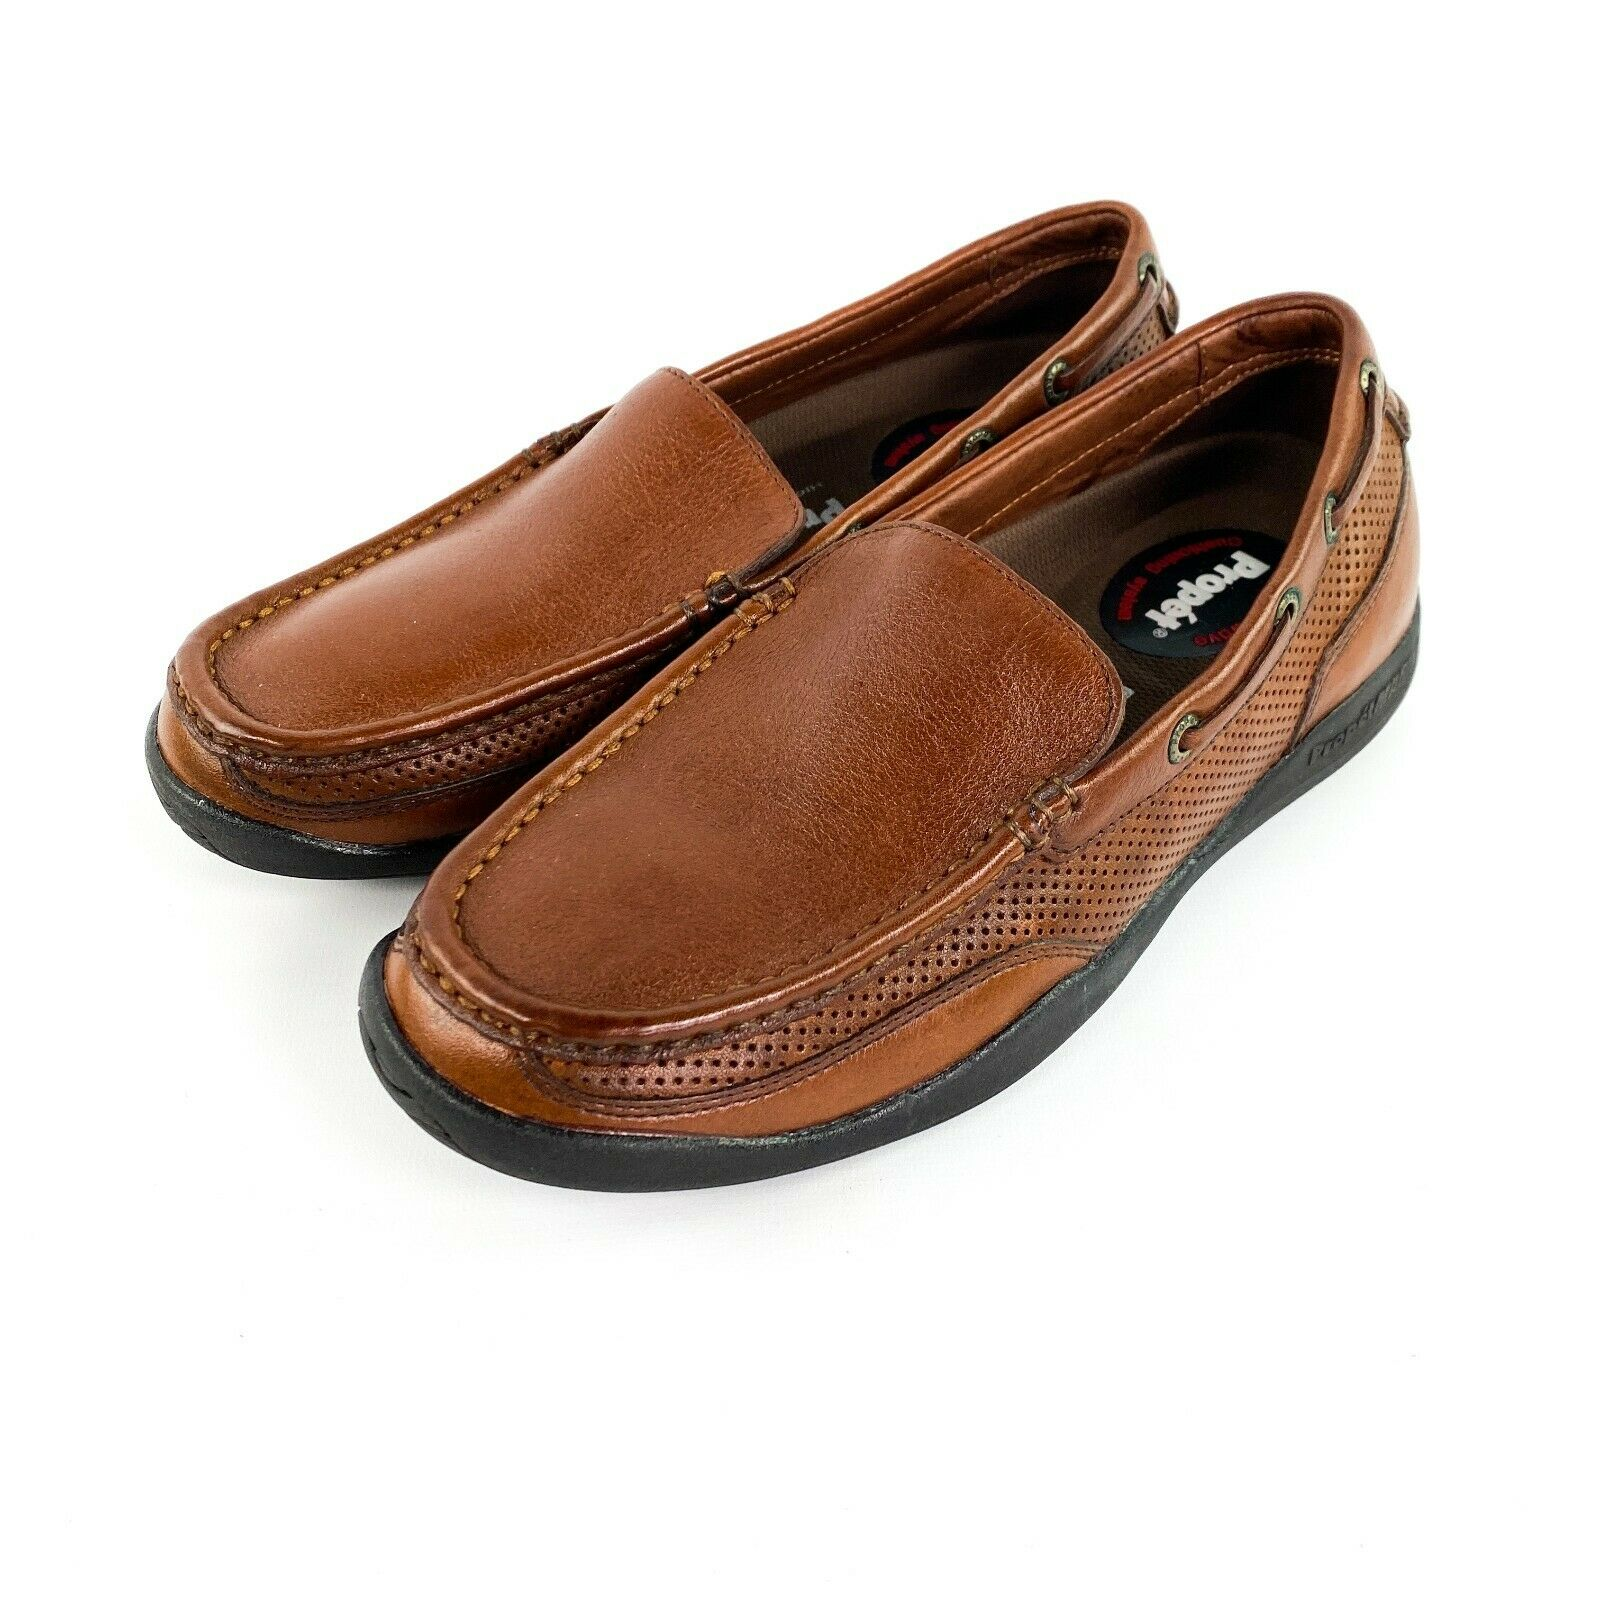 Mens Propét Marine Brown Leather Boat Walking Loafer Shoes Size 8